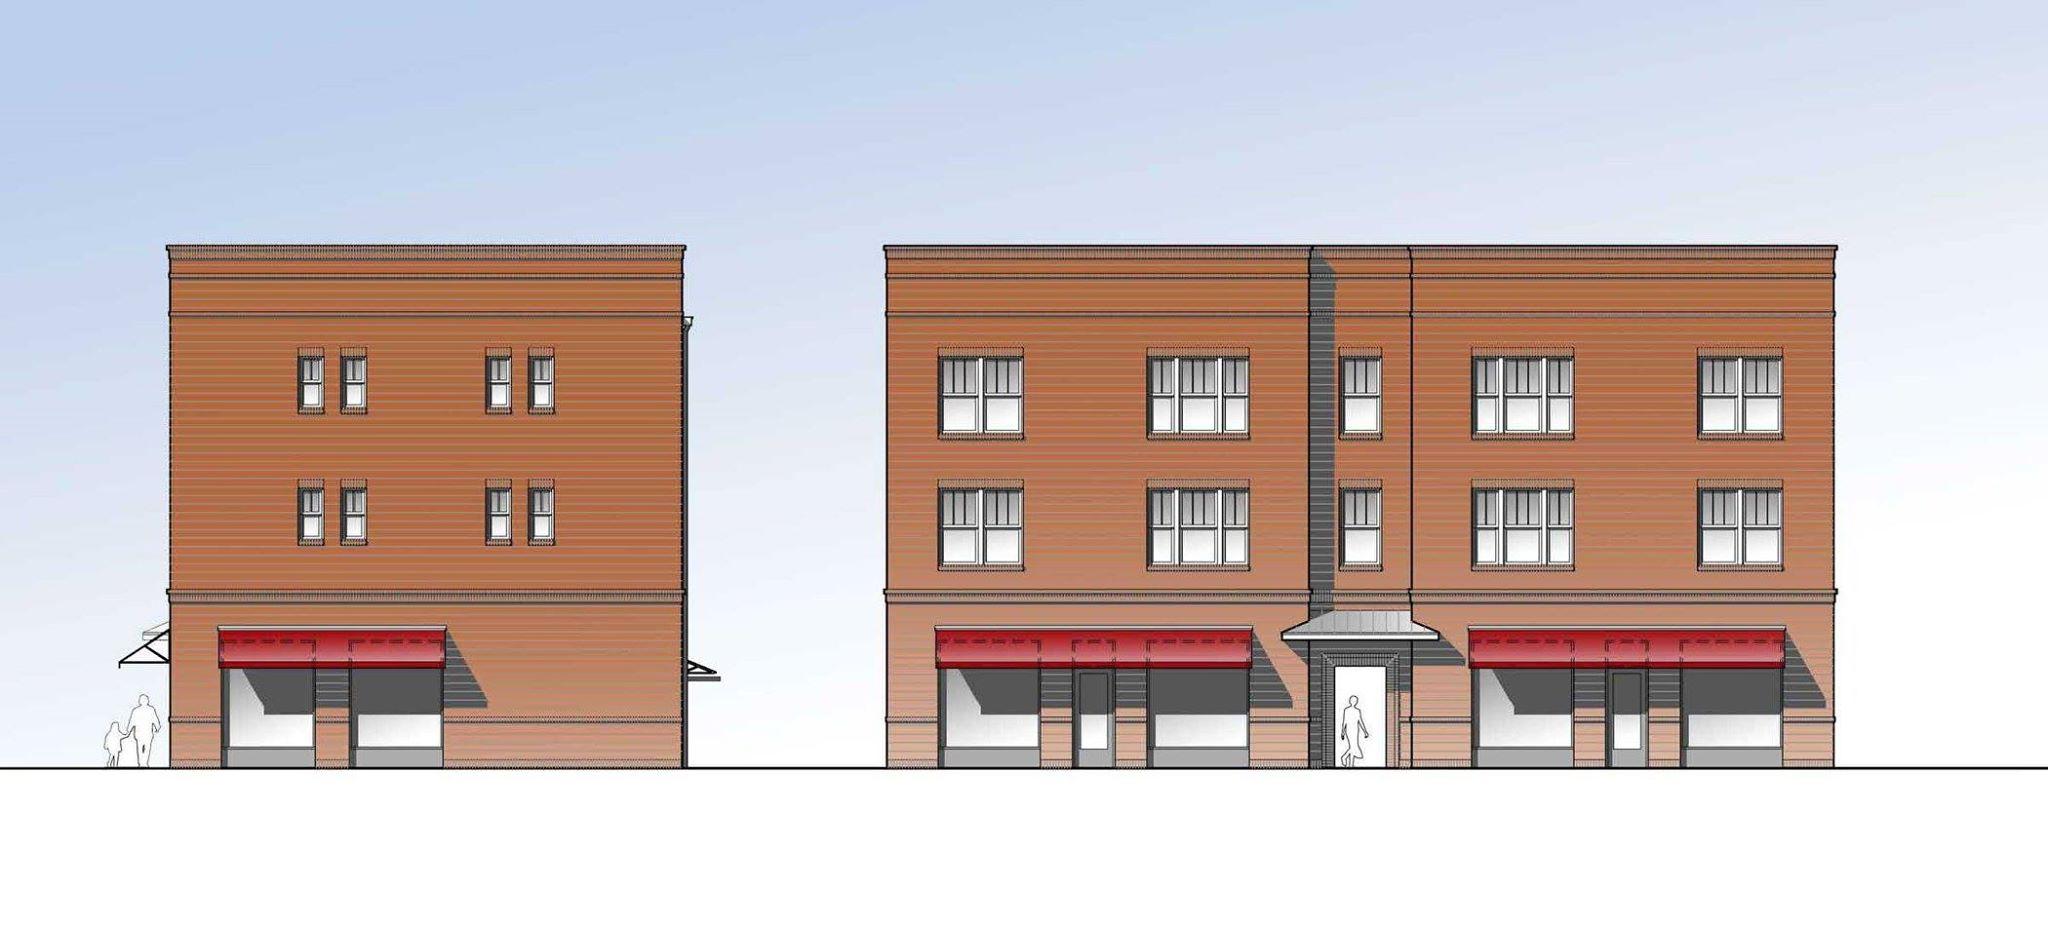 Salimos de la jungla renewing church street south housing for 2 story elevator cost